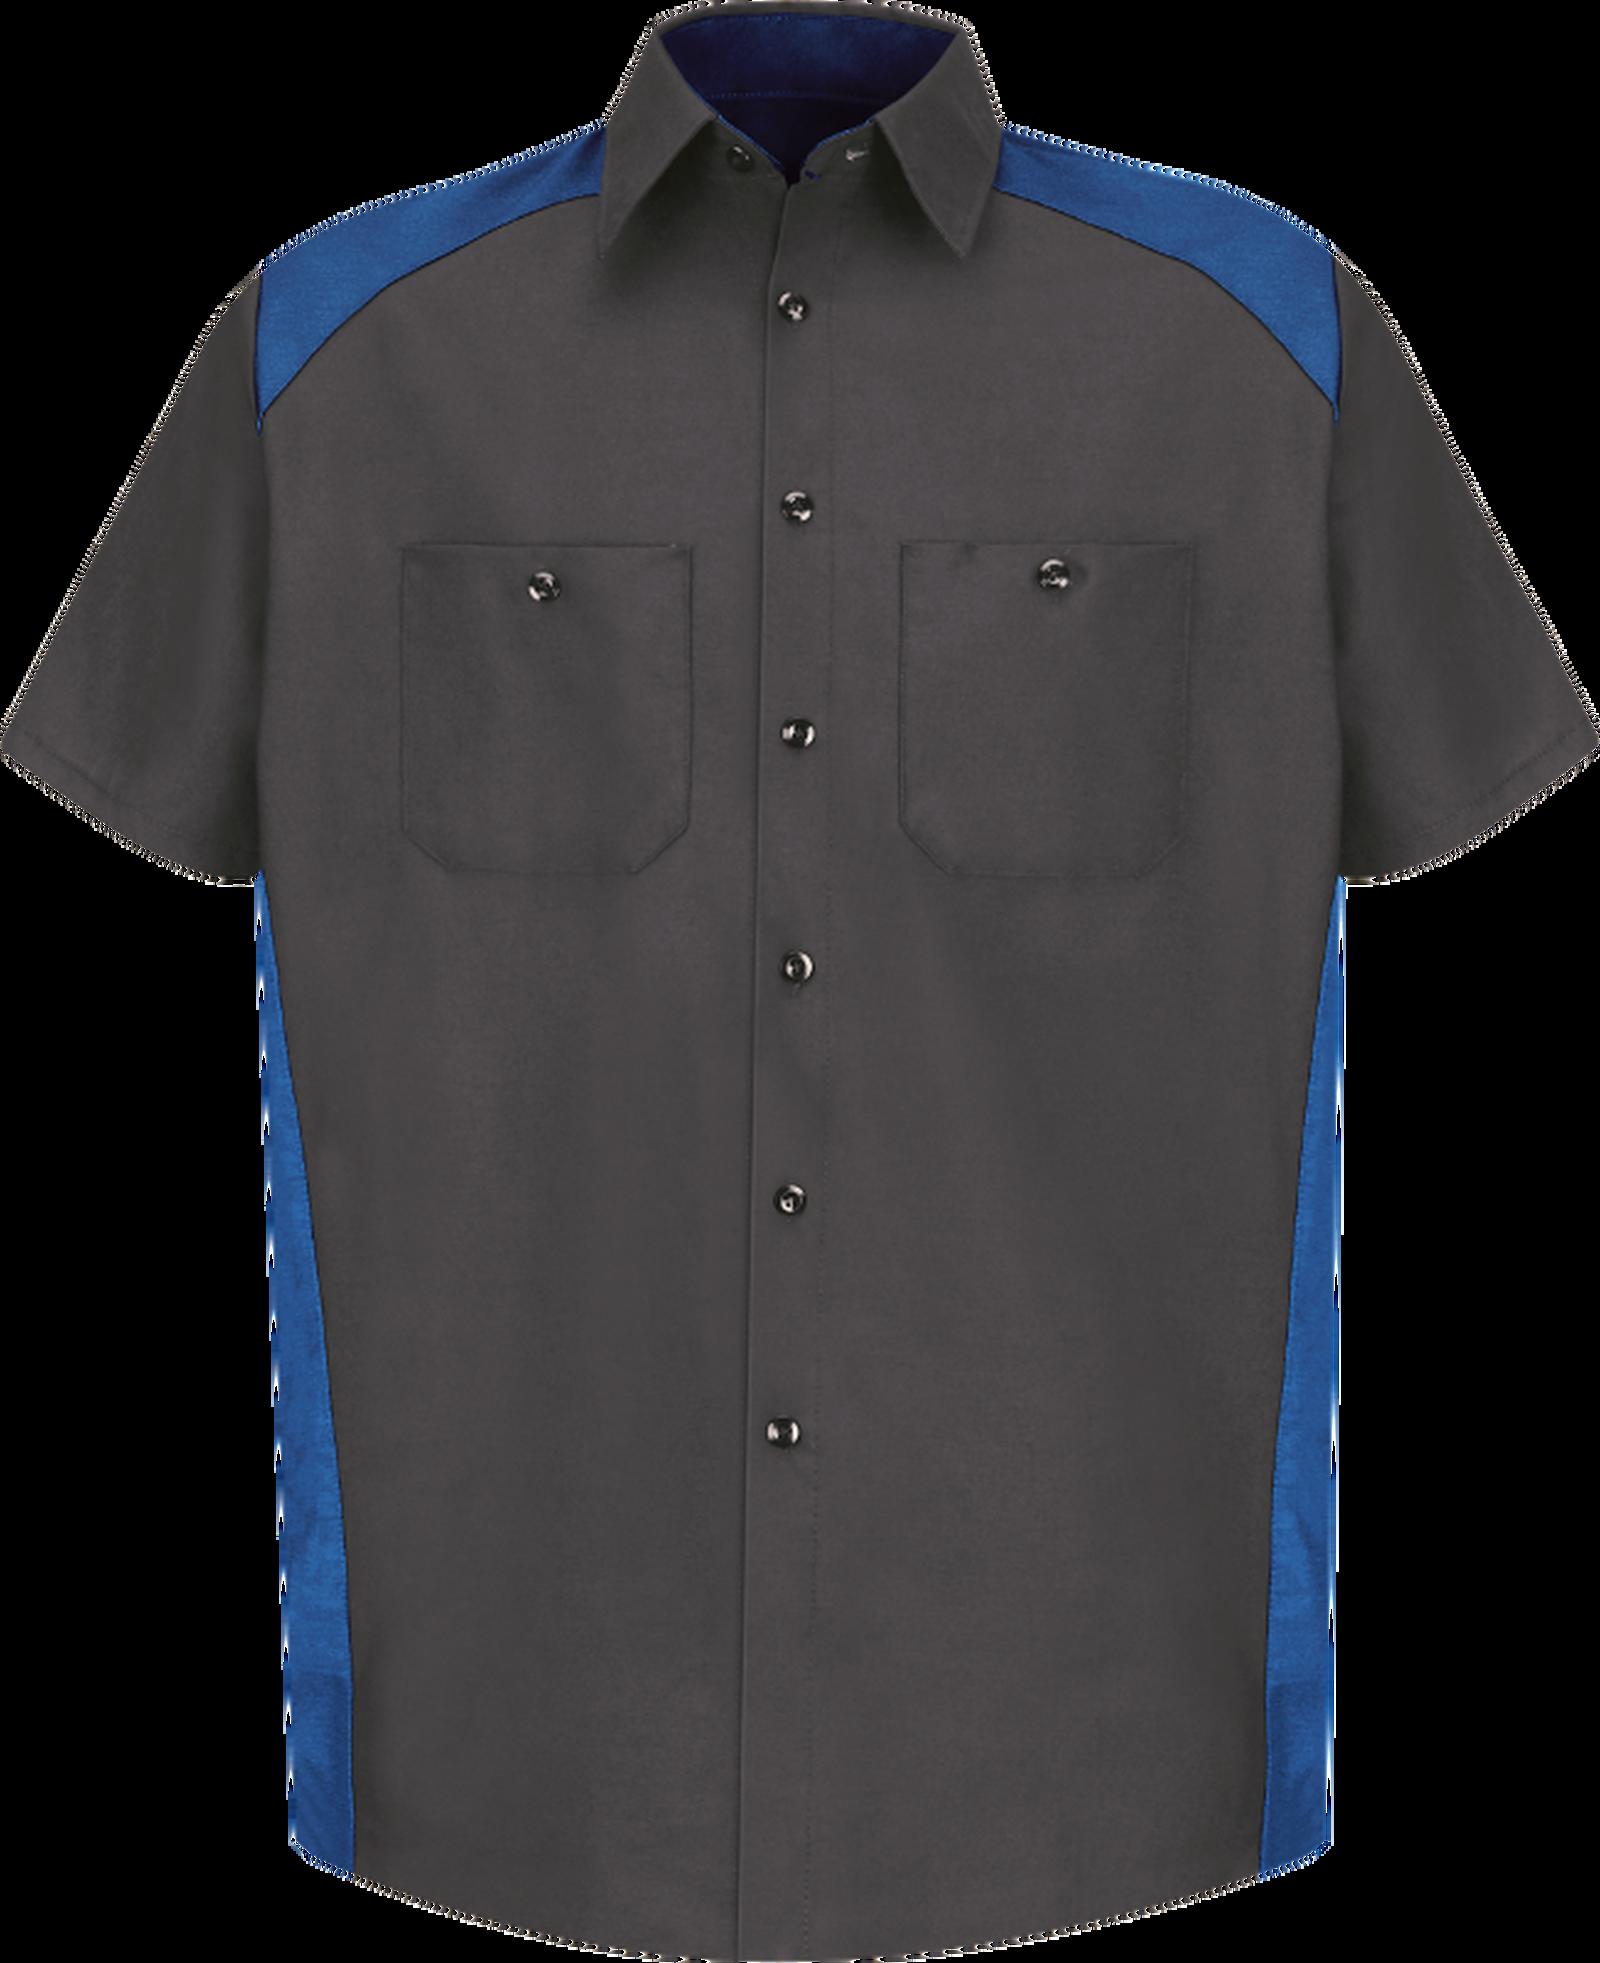 Men's Short Sleeve Motorsports Shirt